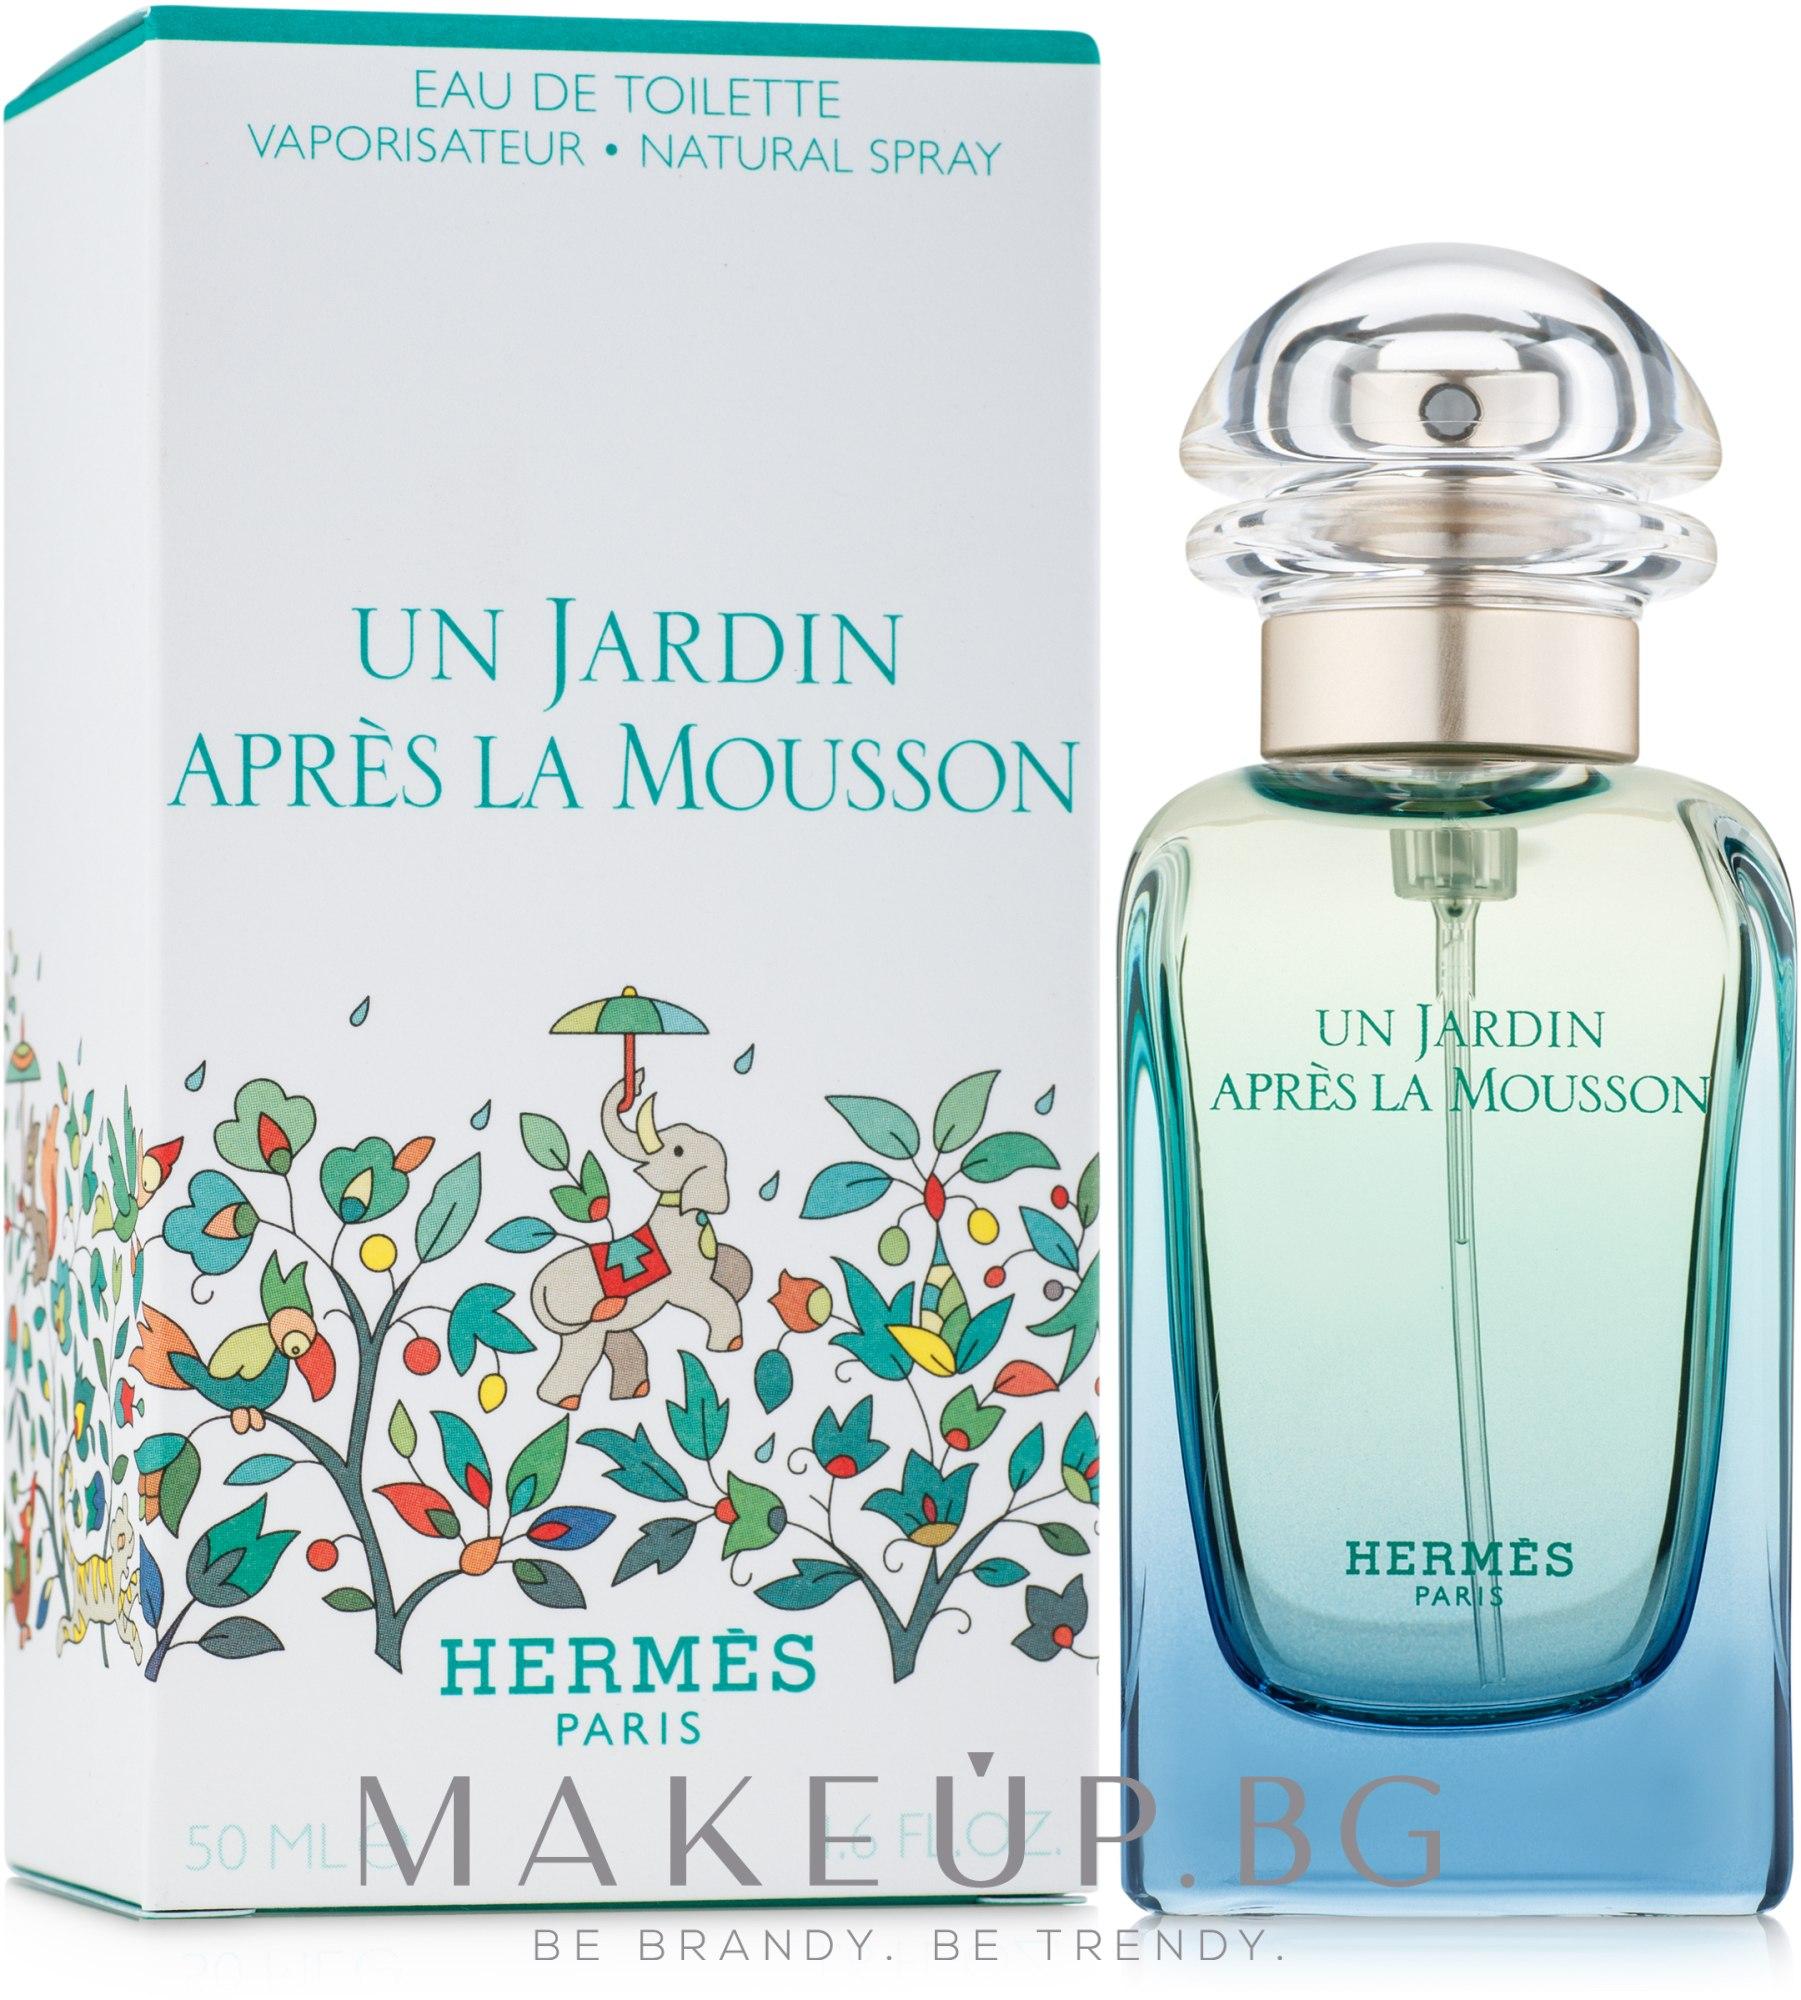 Hermes Un Jardin Apres la Mousson - Тоалетна вода — снимка 50 ml